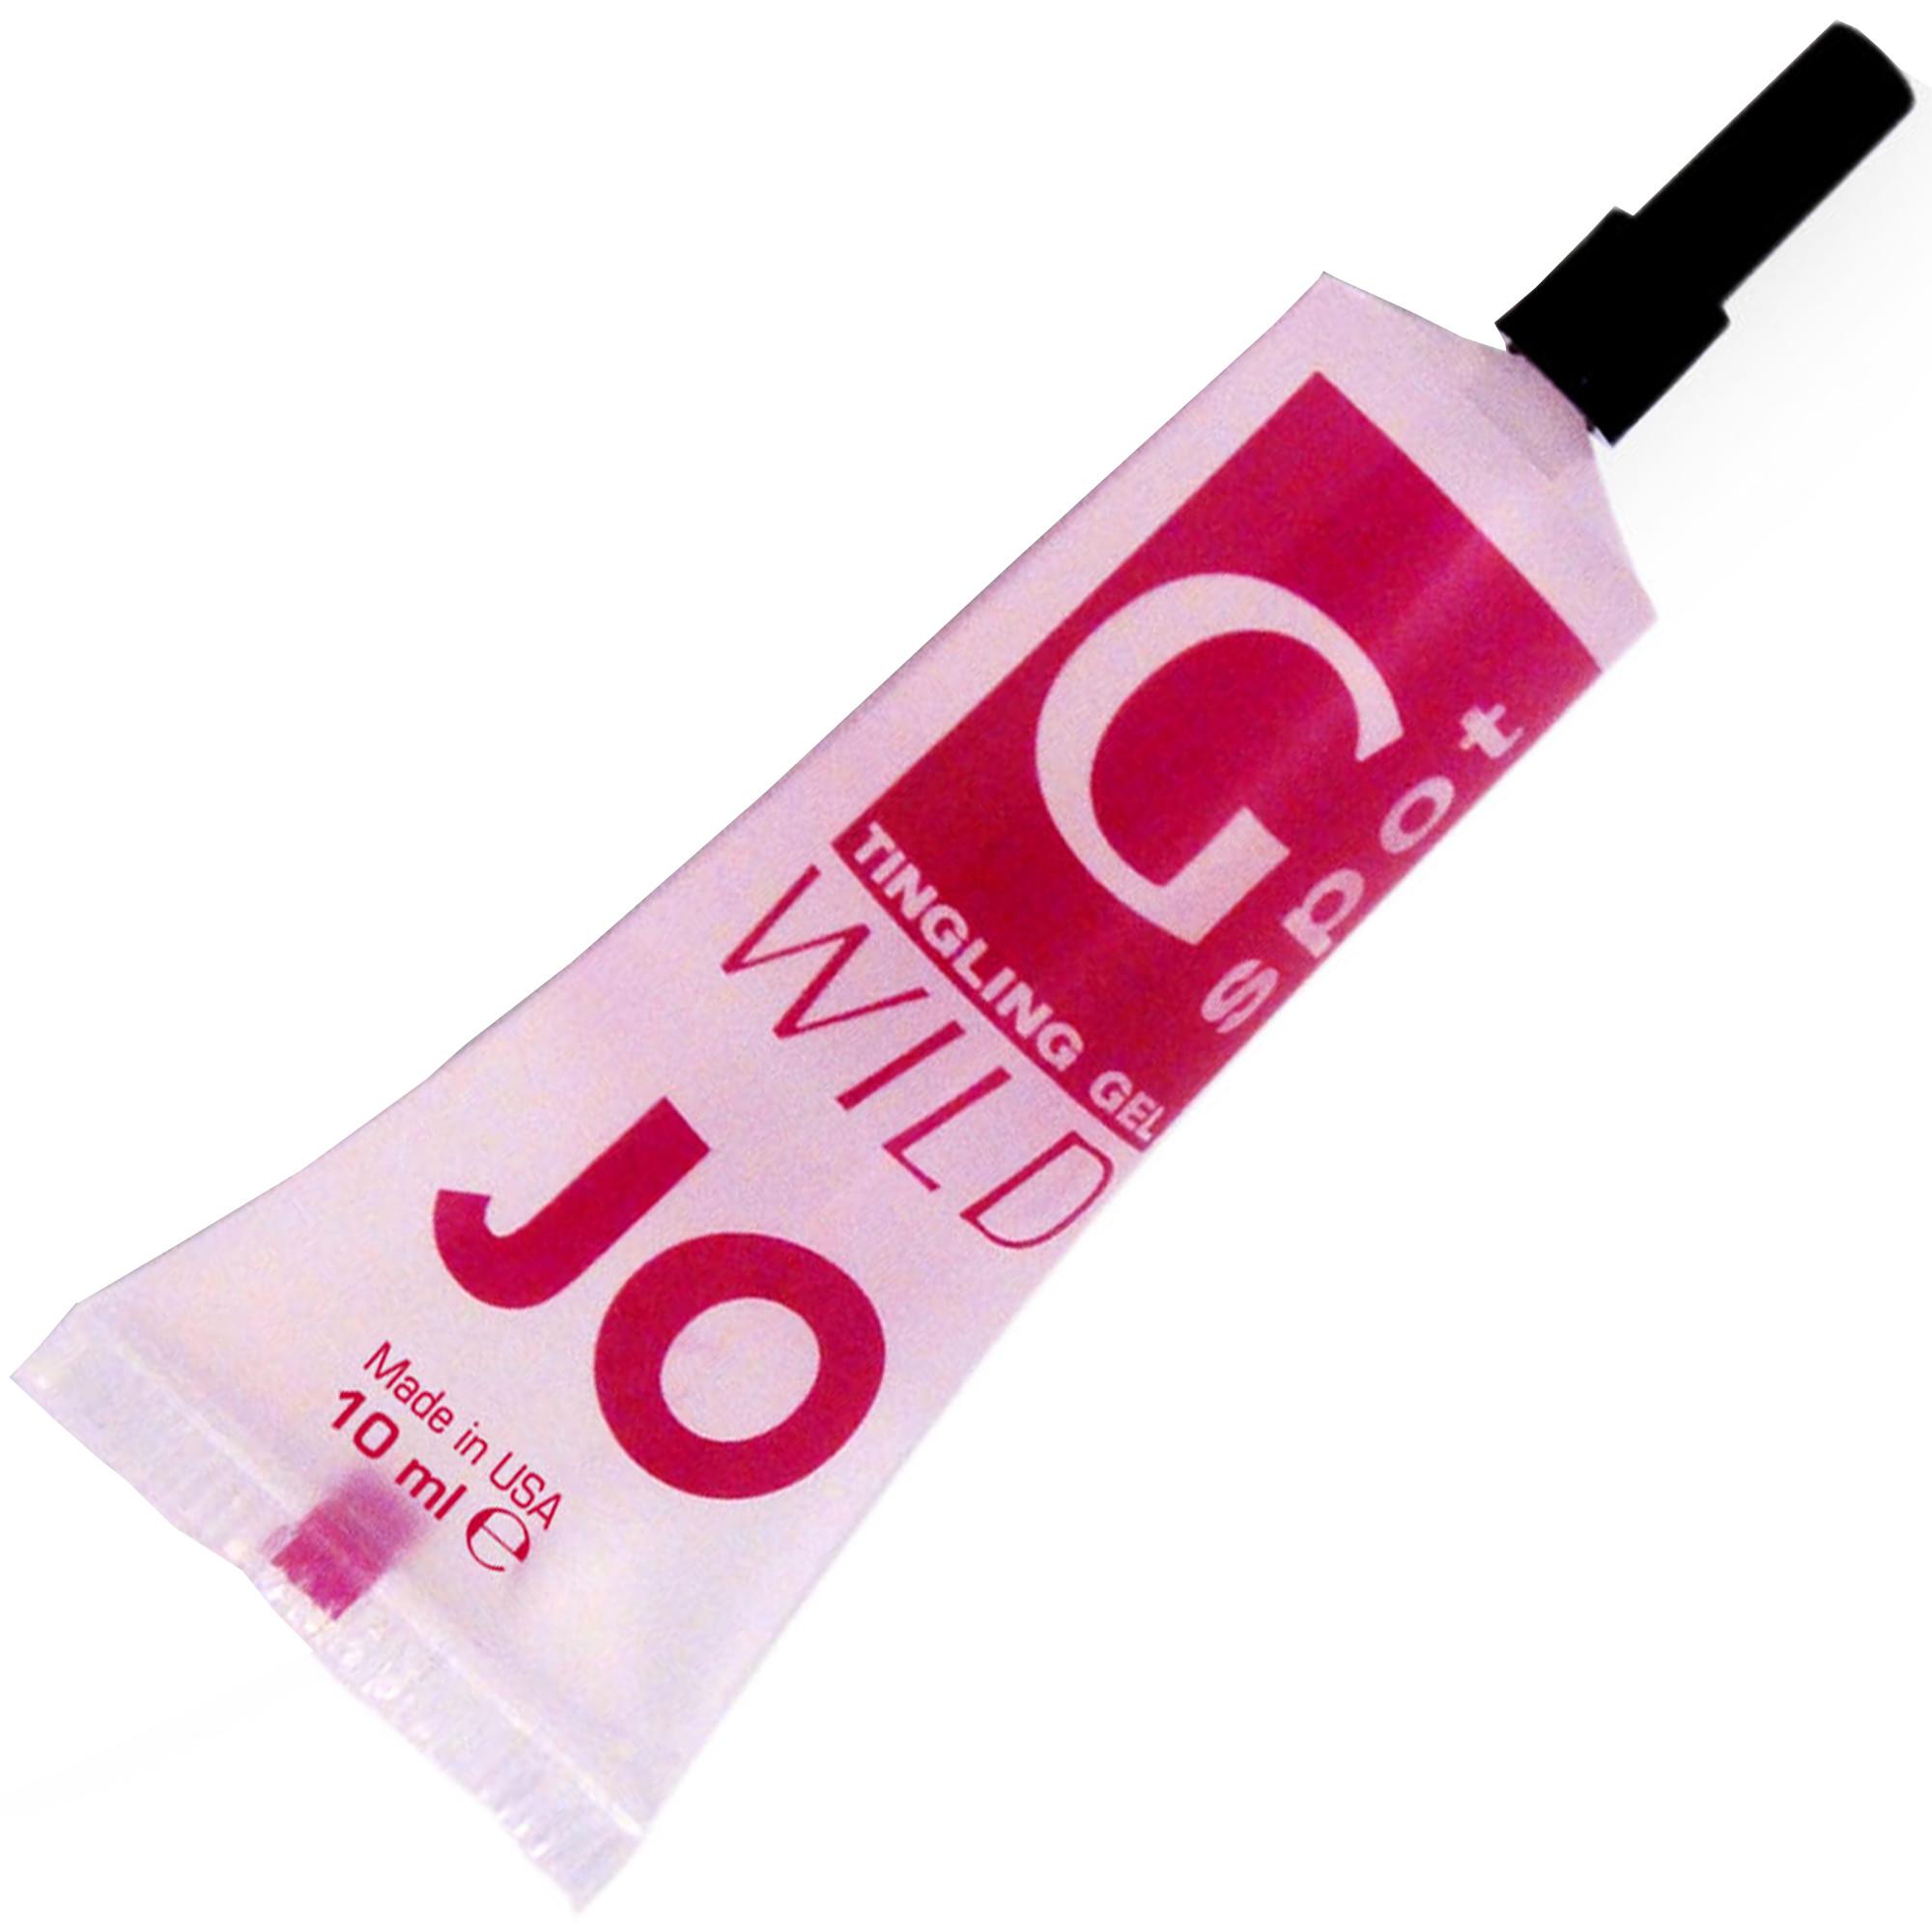 JO Arctic clitoral stimulant